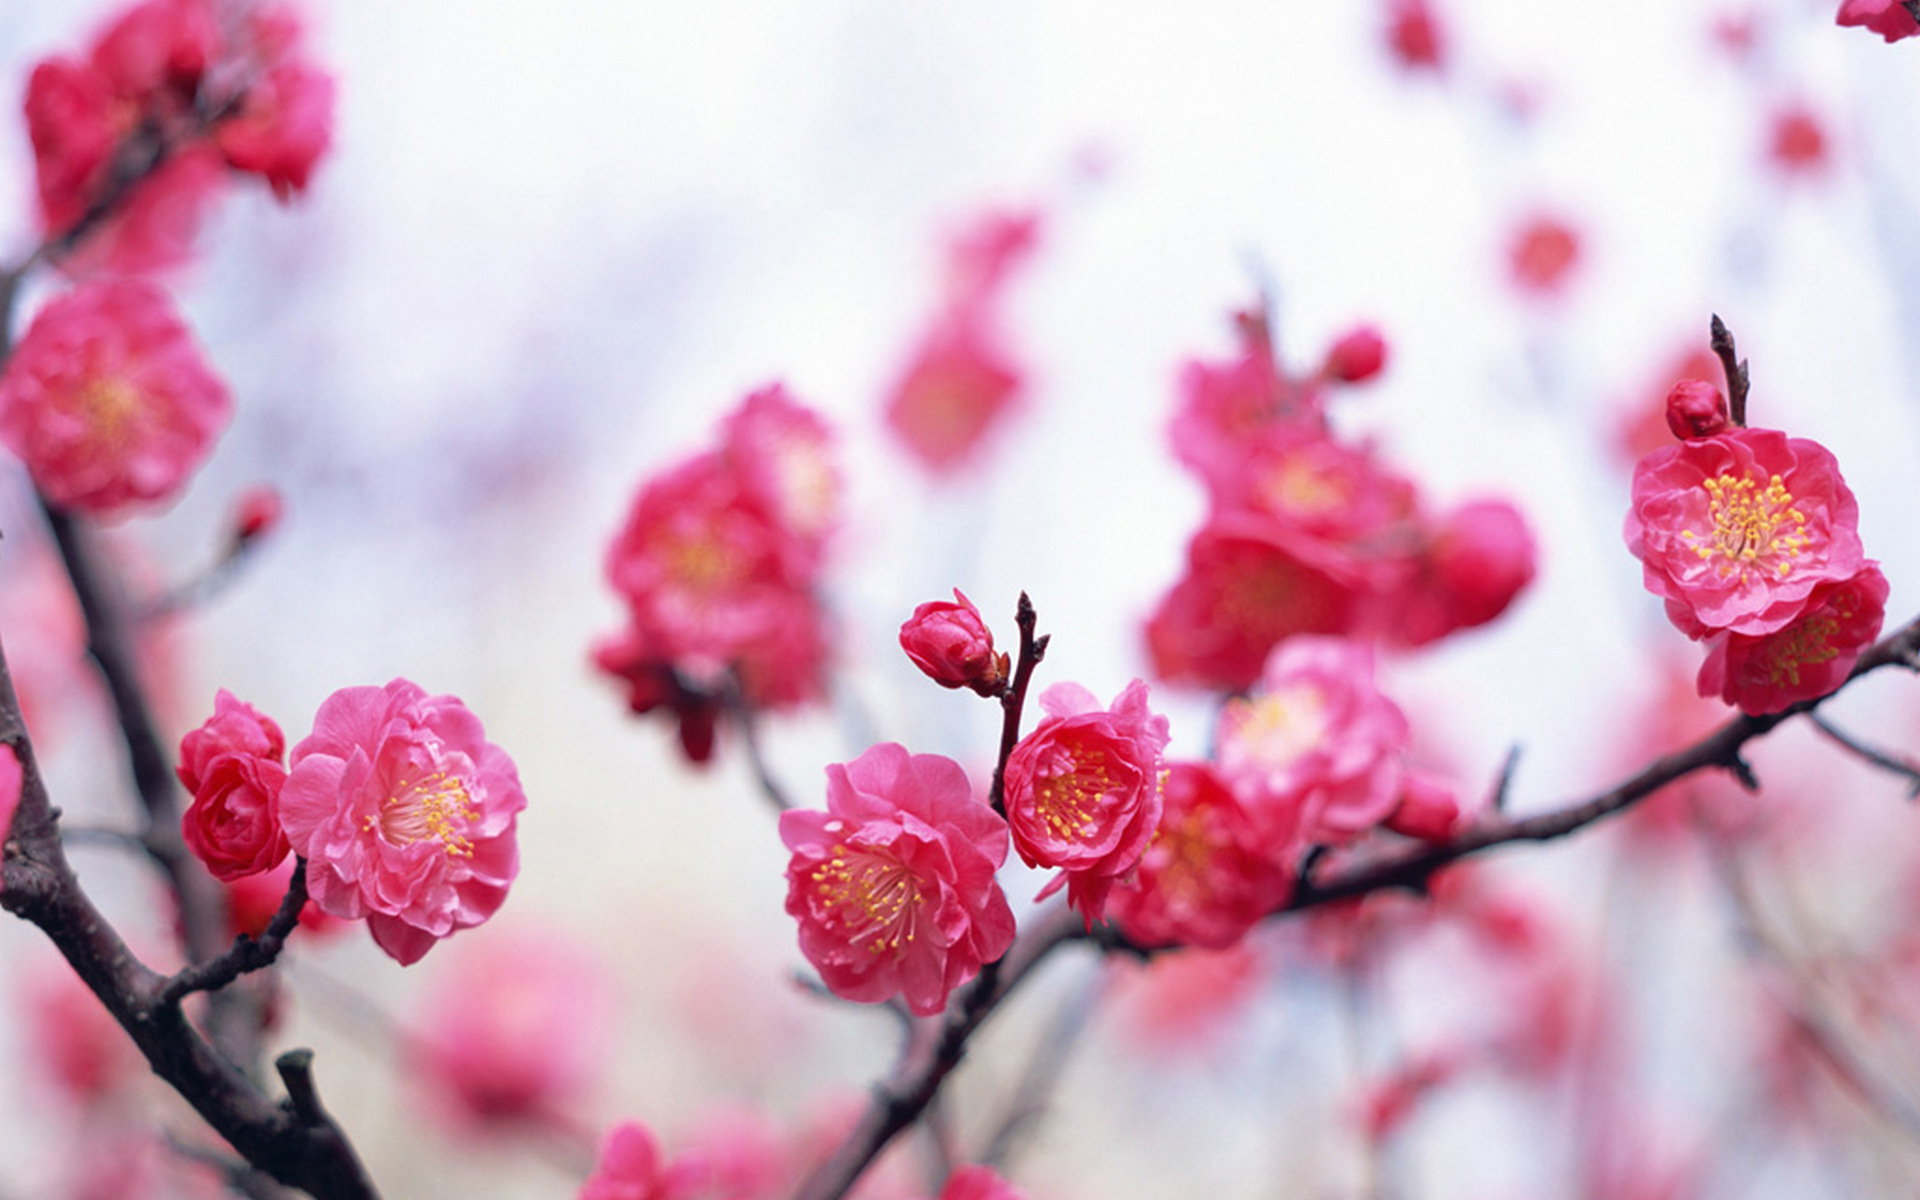 Pink flowers pic hd desktop wallpapers 4k hd - Pink flower wallpaper background ...